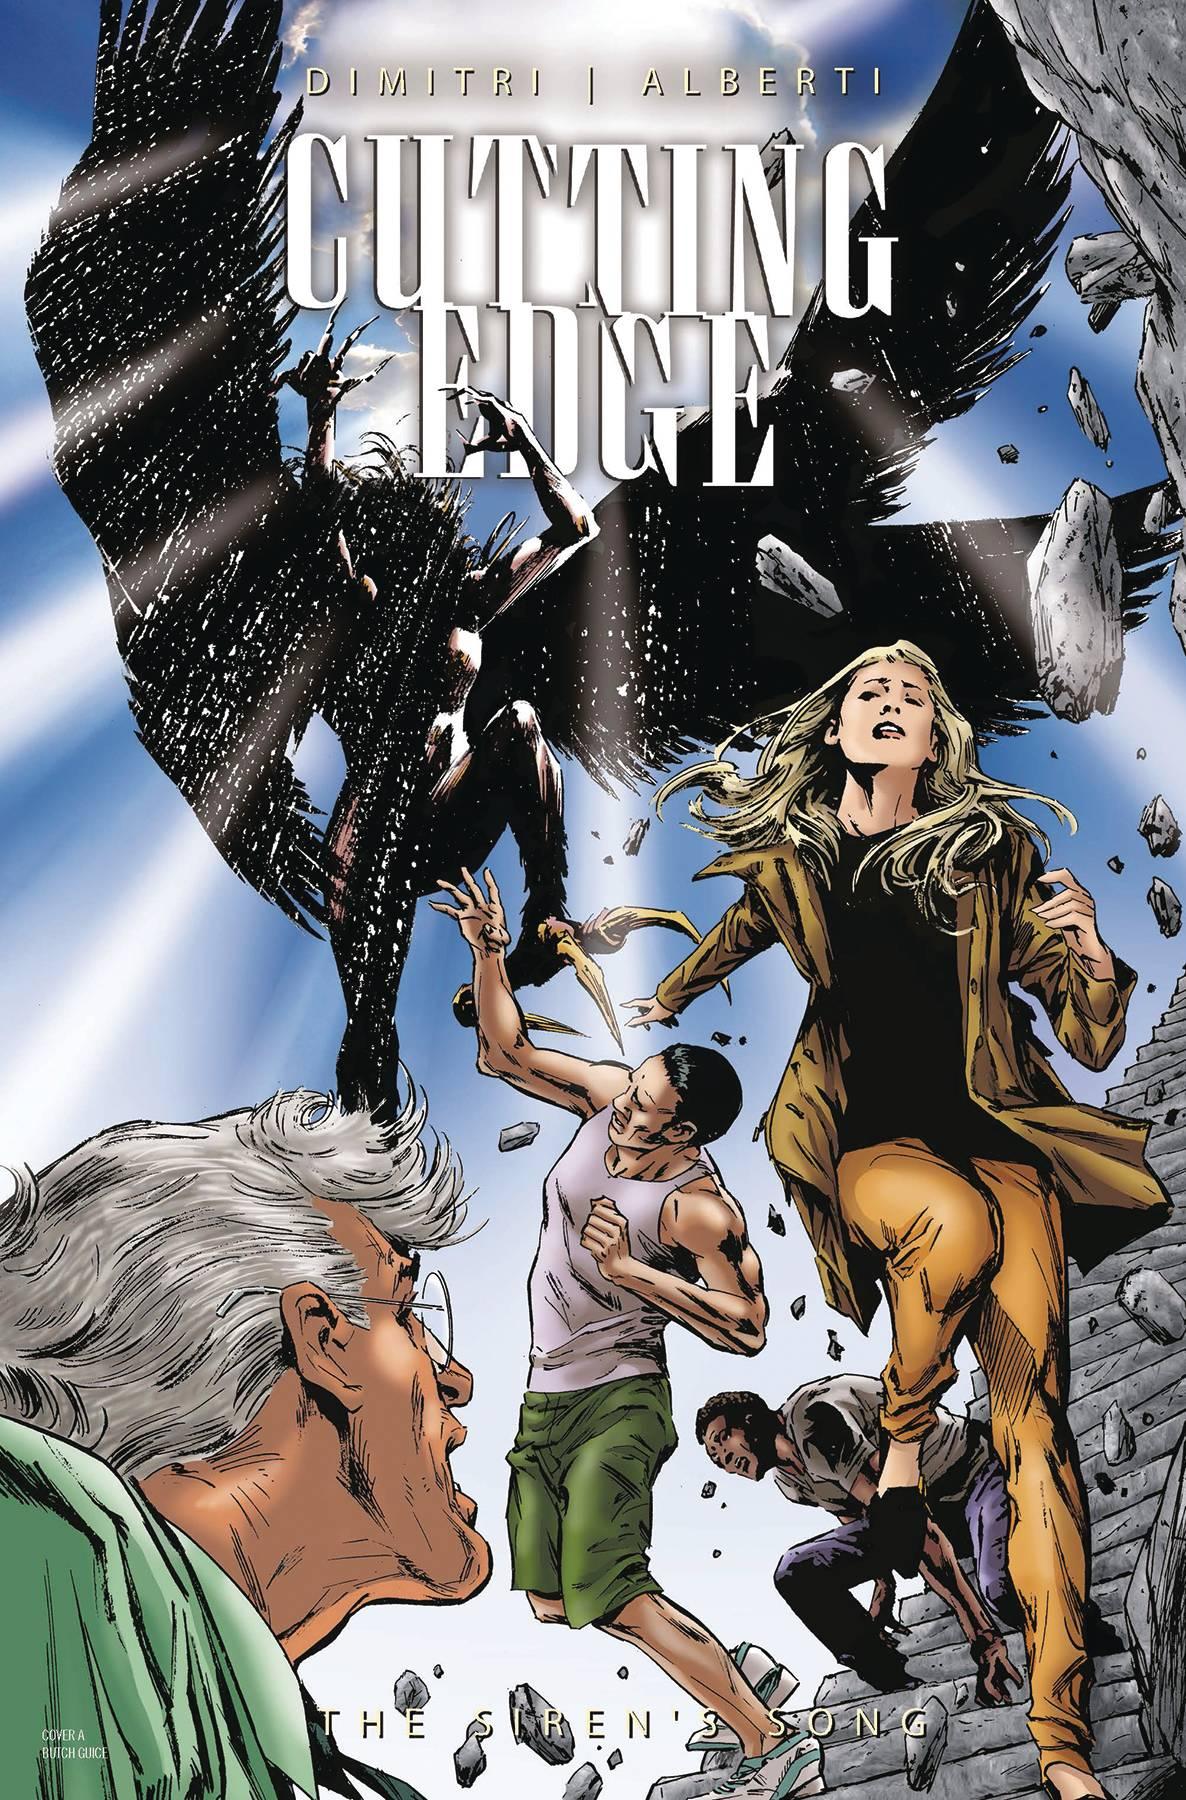 Cutting Edge: The Siren's Song #1 (2020)